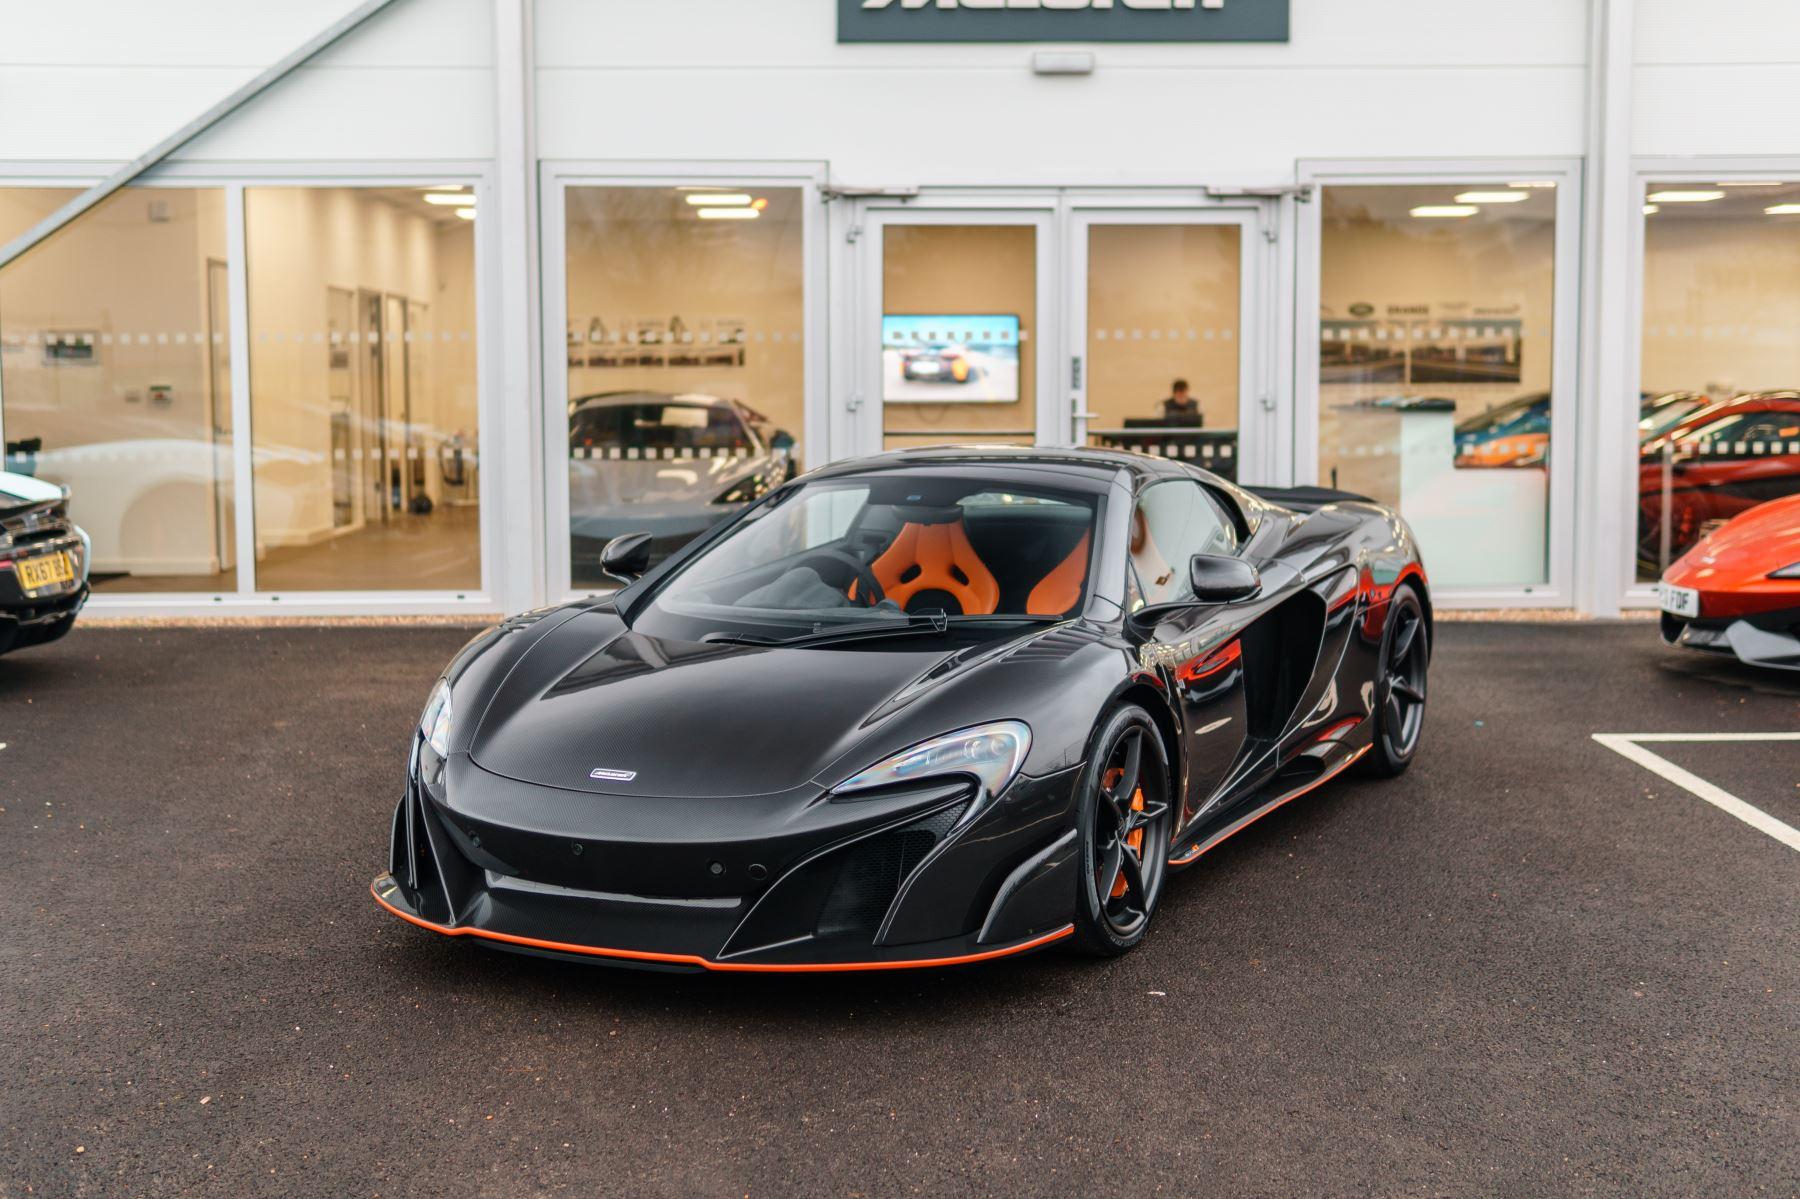 McLaren 675LT Spider MSO Carbon Series image 2